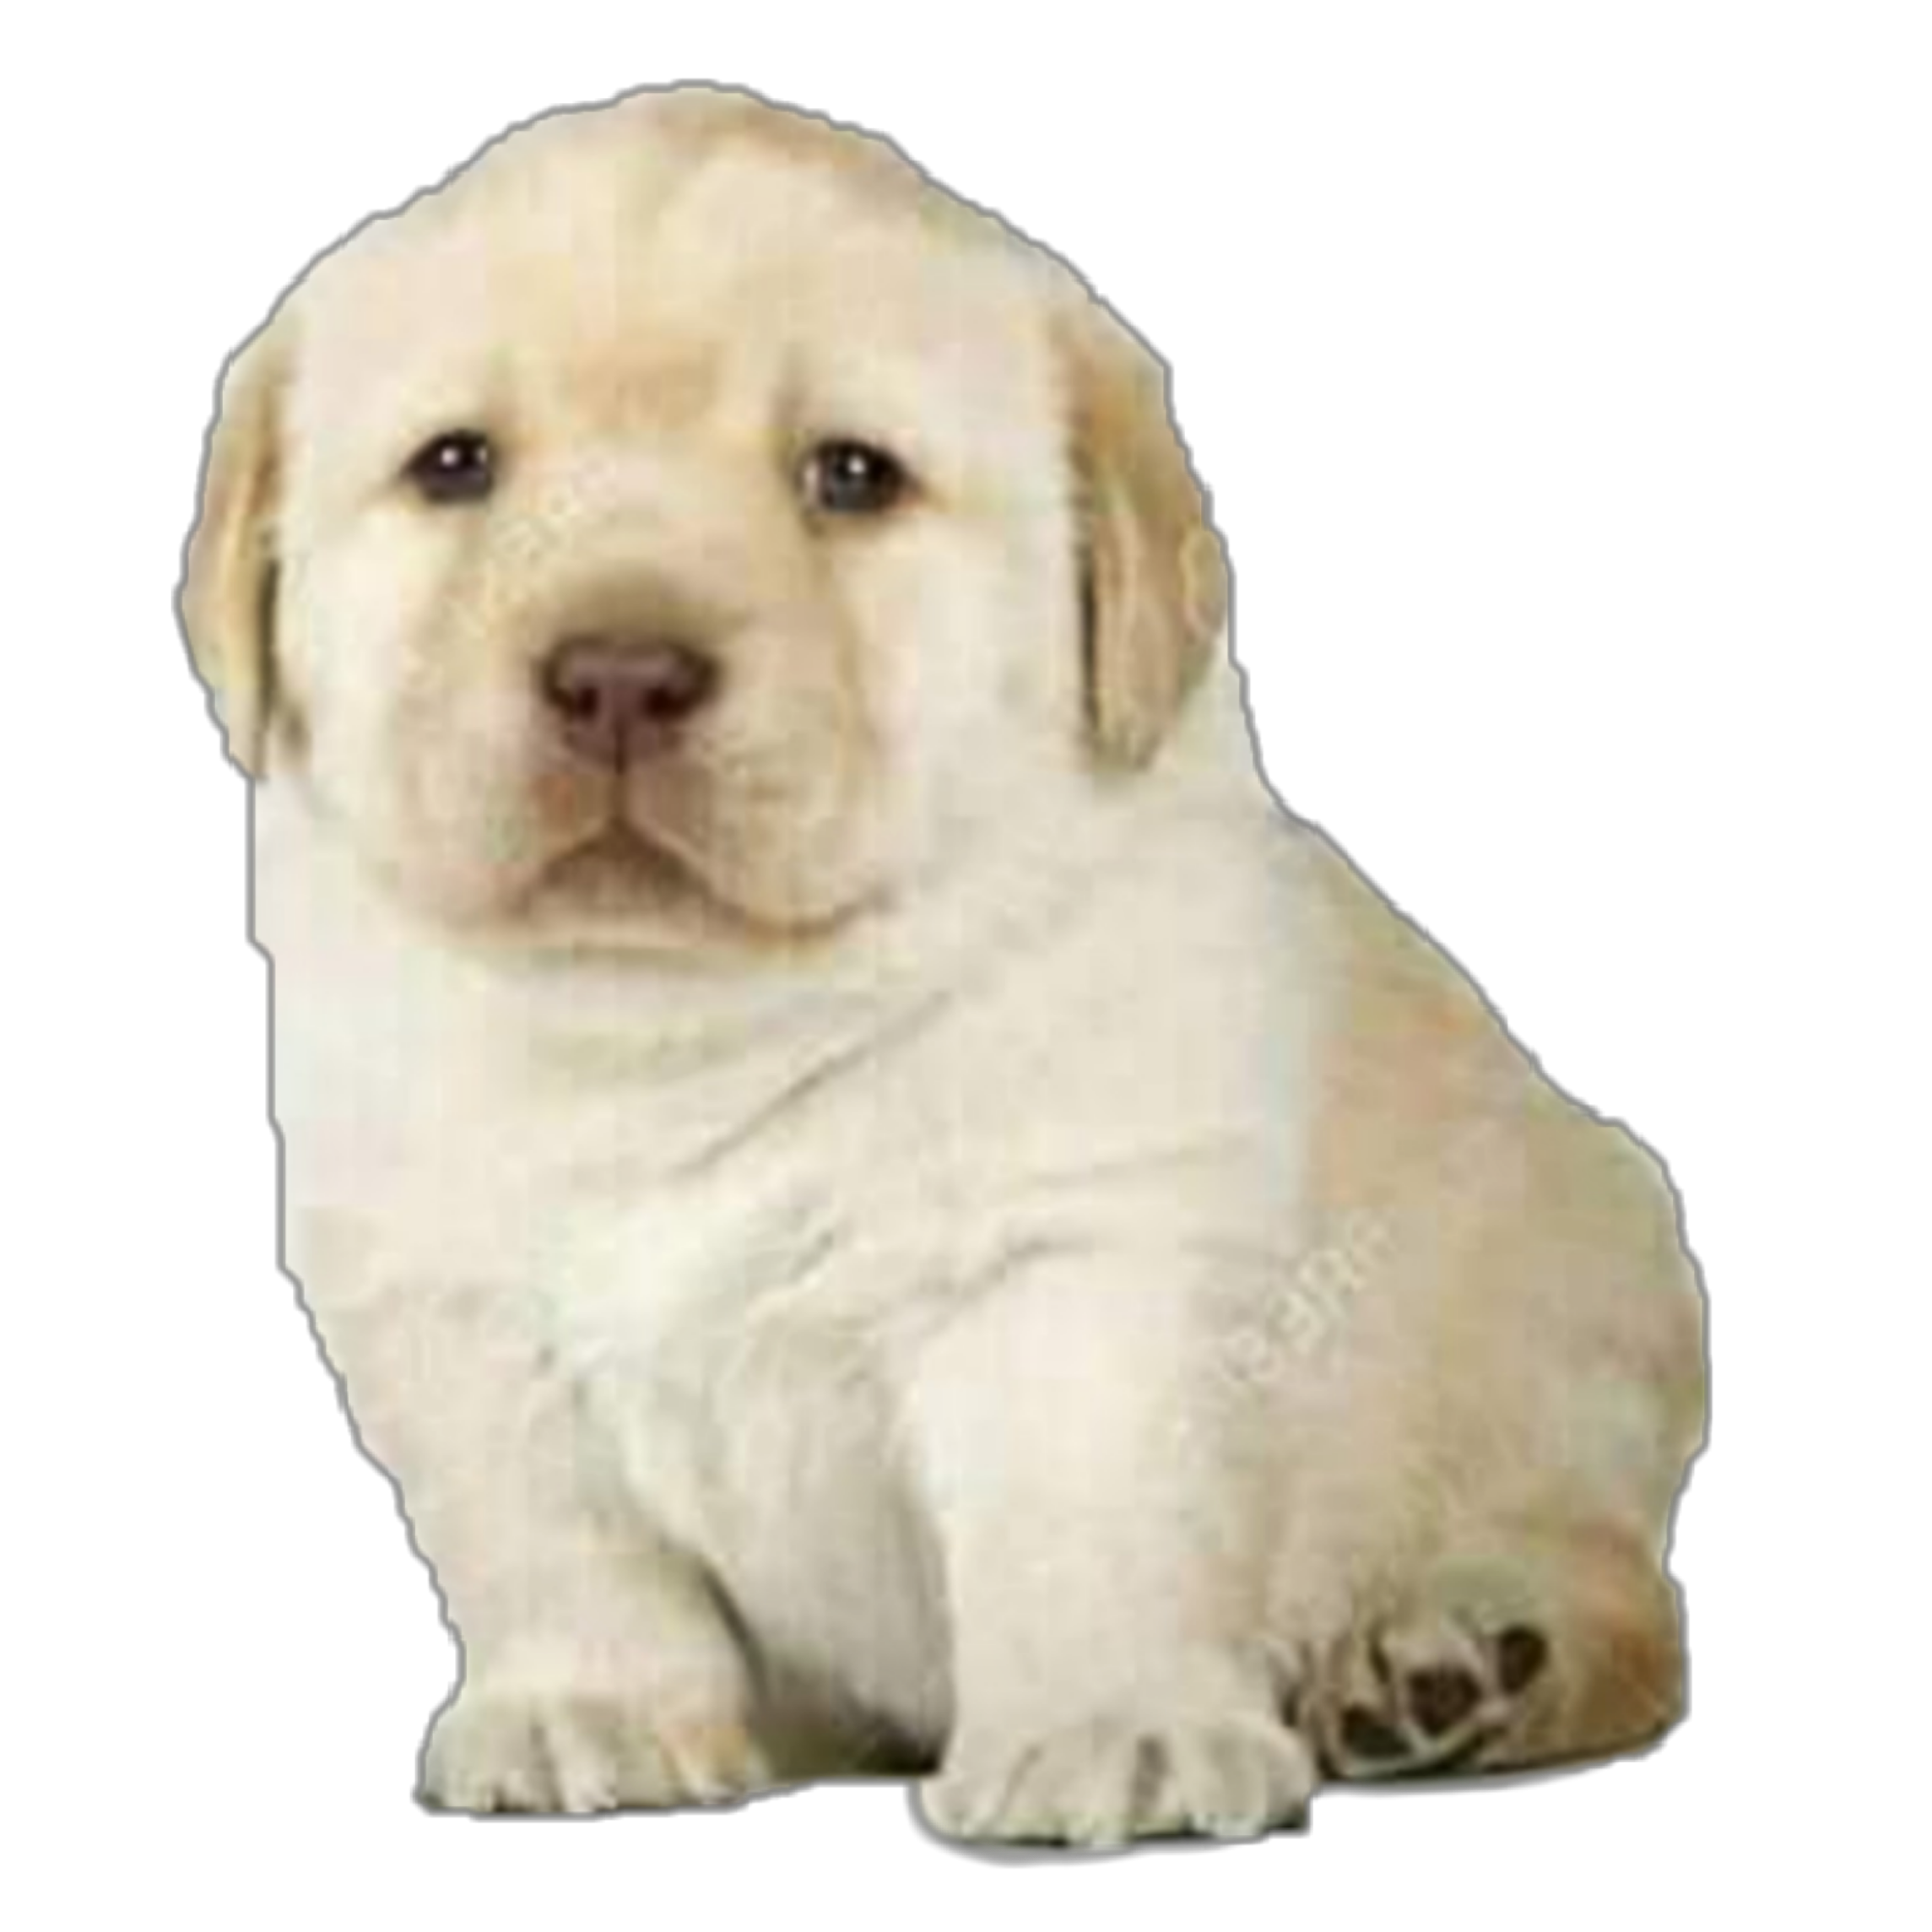 perro cachorro meme moda - Sticker by Eliza Nuñez